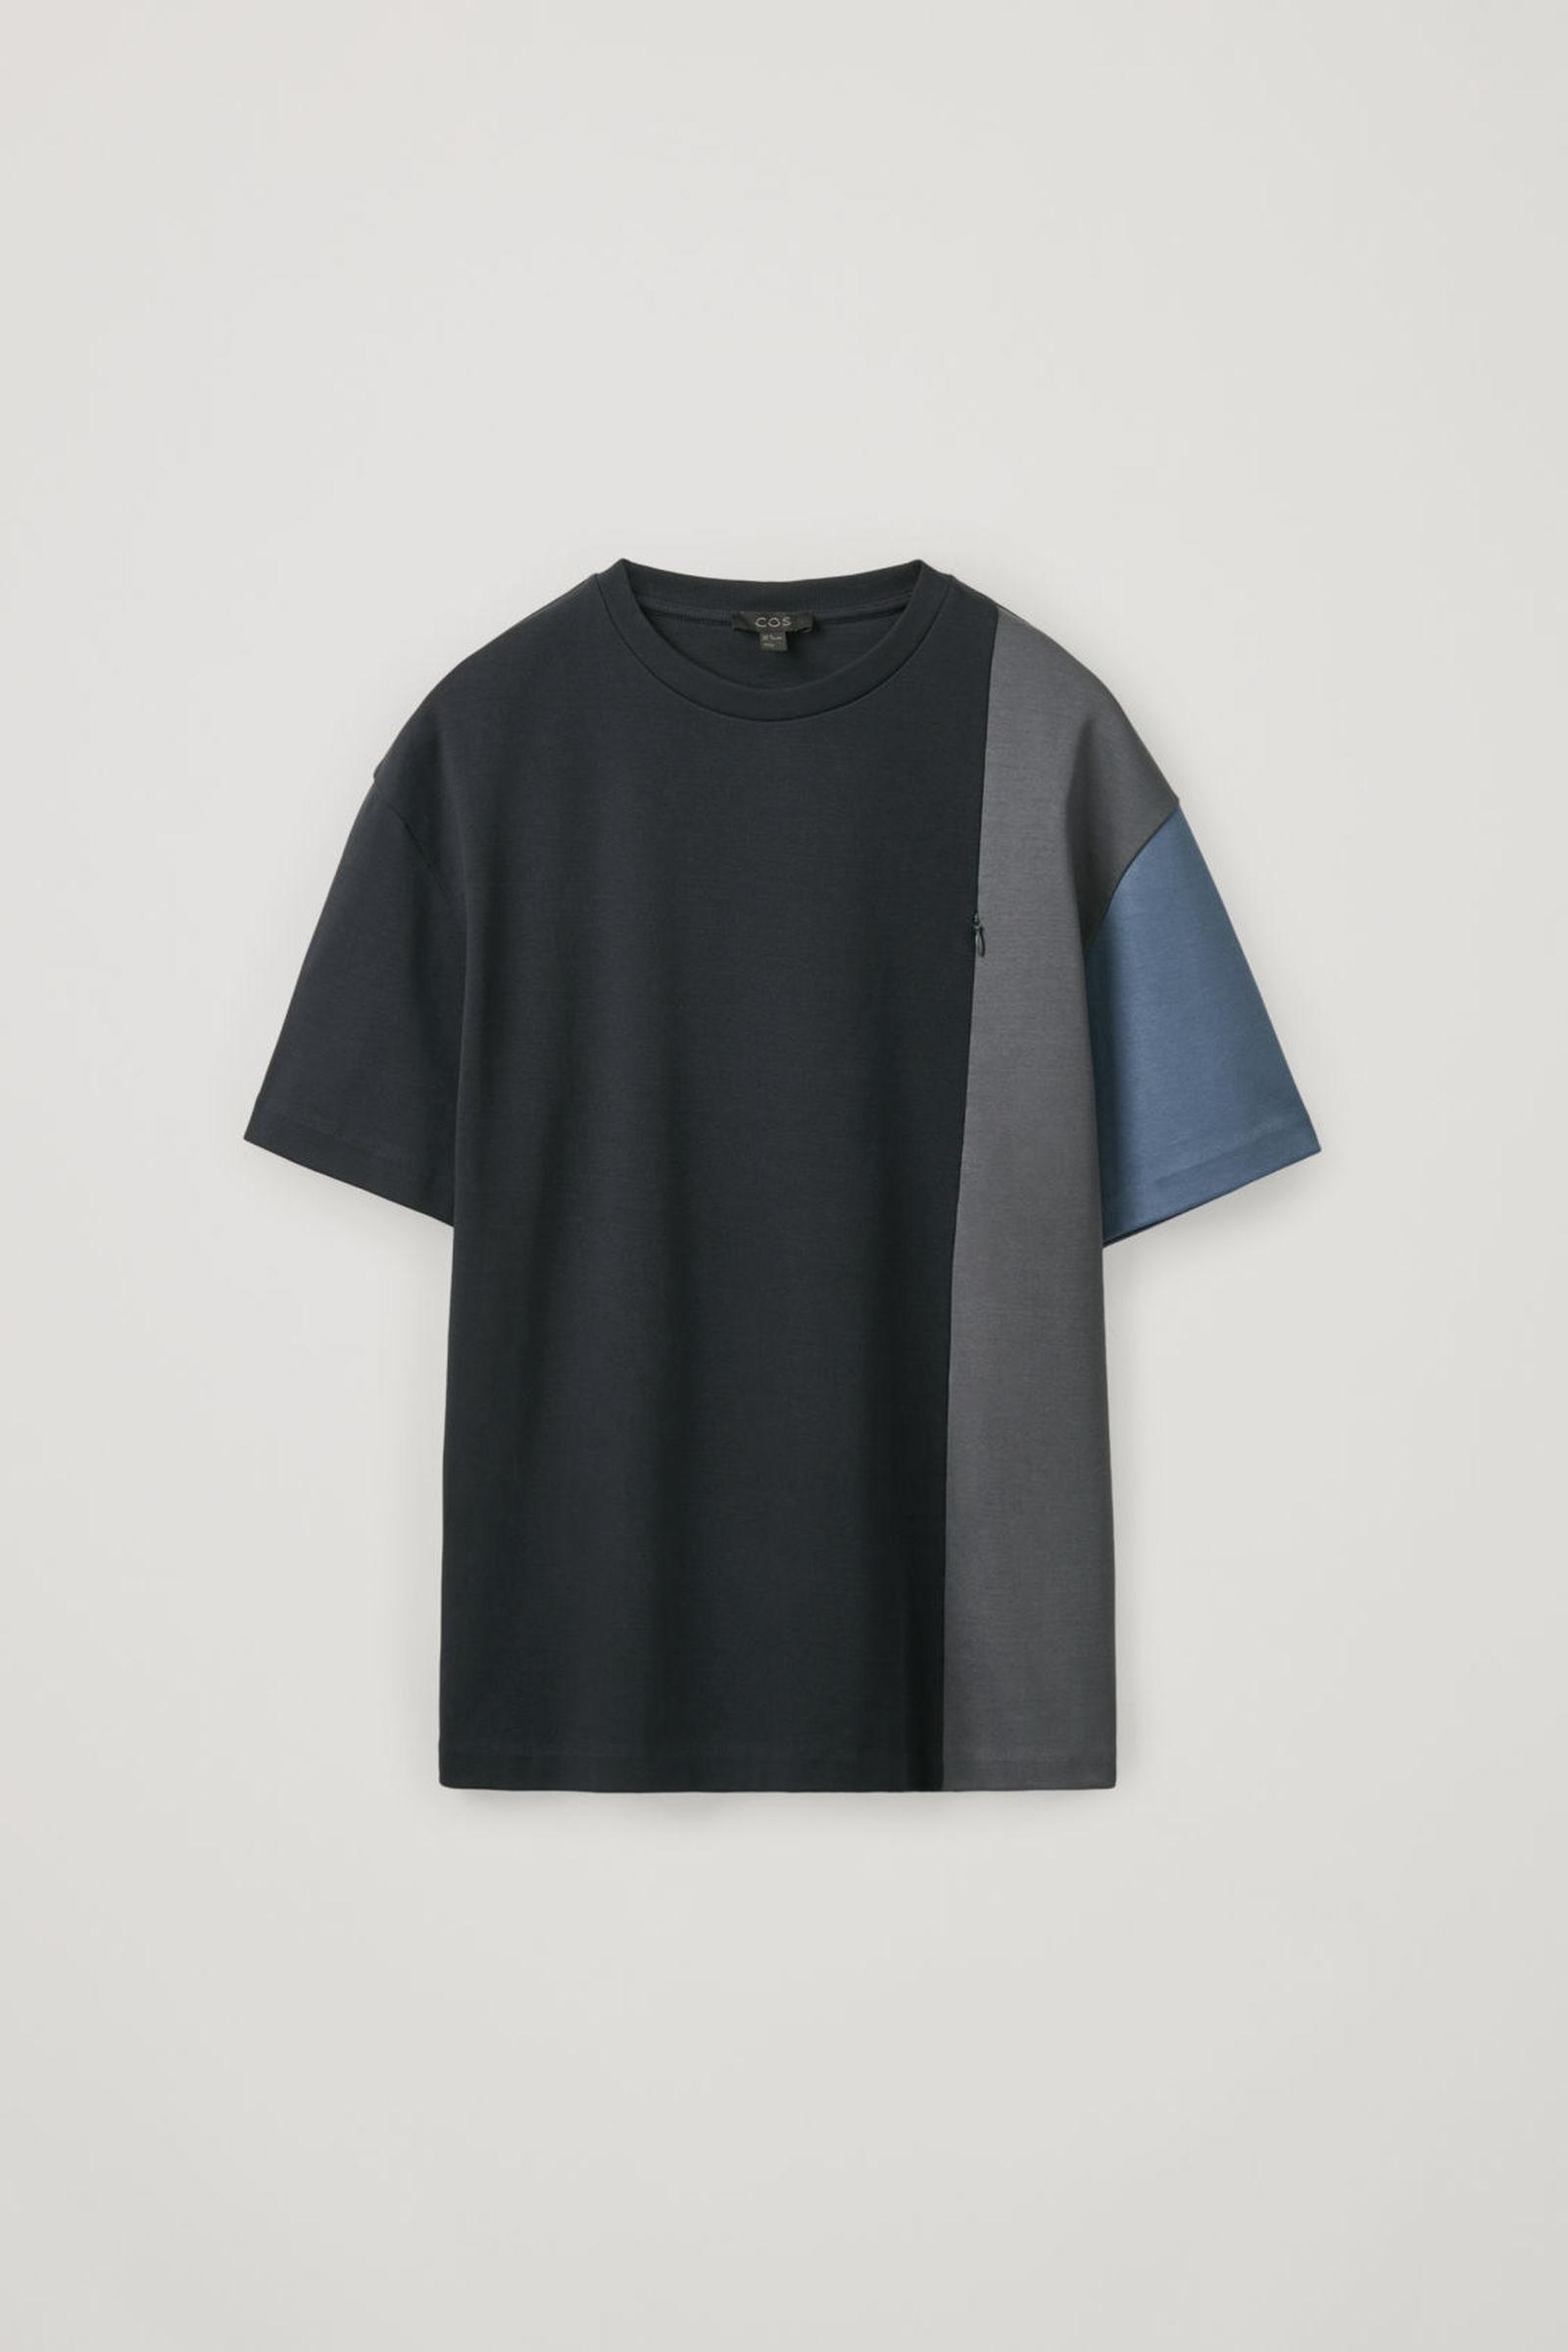 COS 코튼 패널드 티셔츠의 네이비 / 블루 / 그레이컬러 Product입니다.